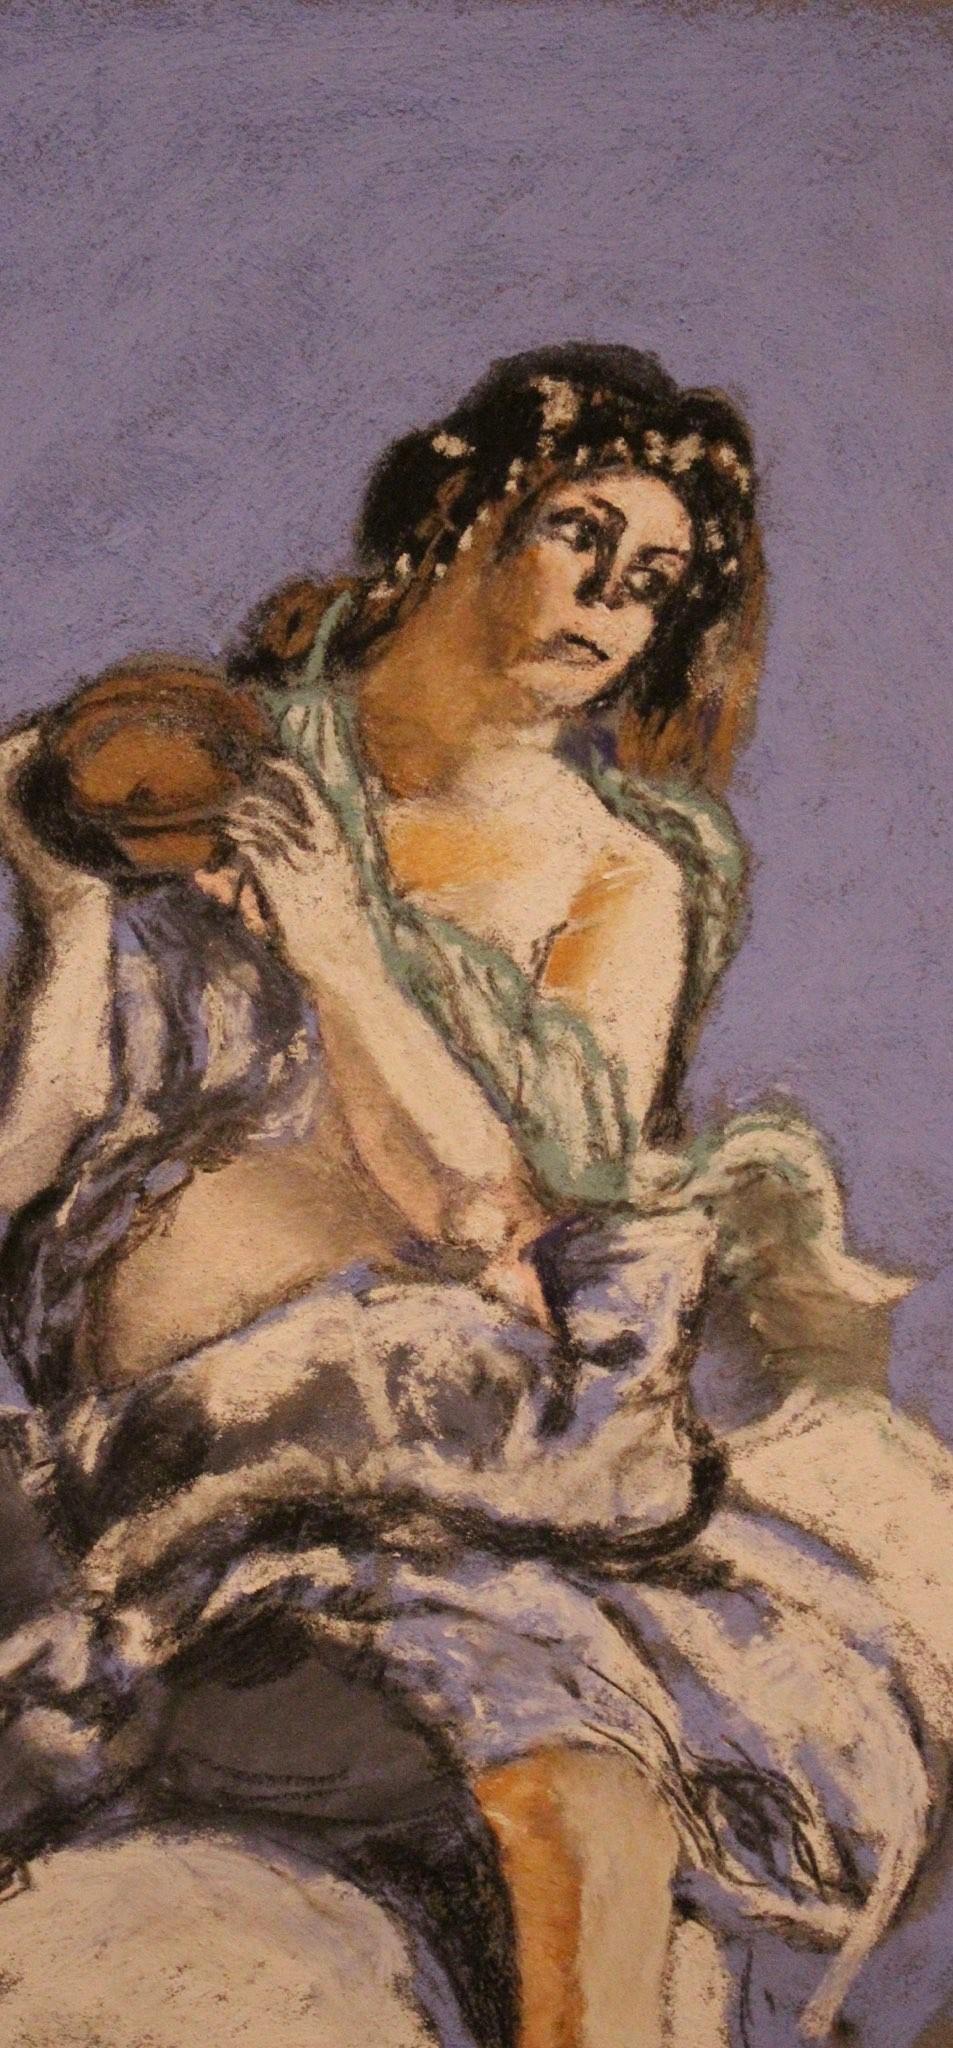 Anne Flora De Negroni - Hommage à Artemisia Gentileschi